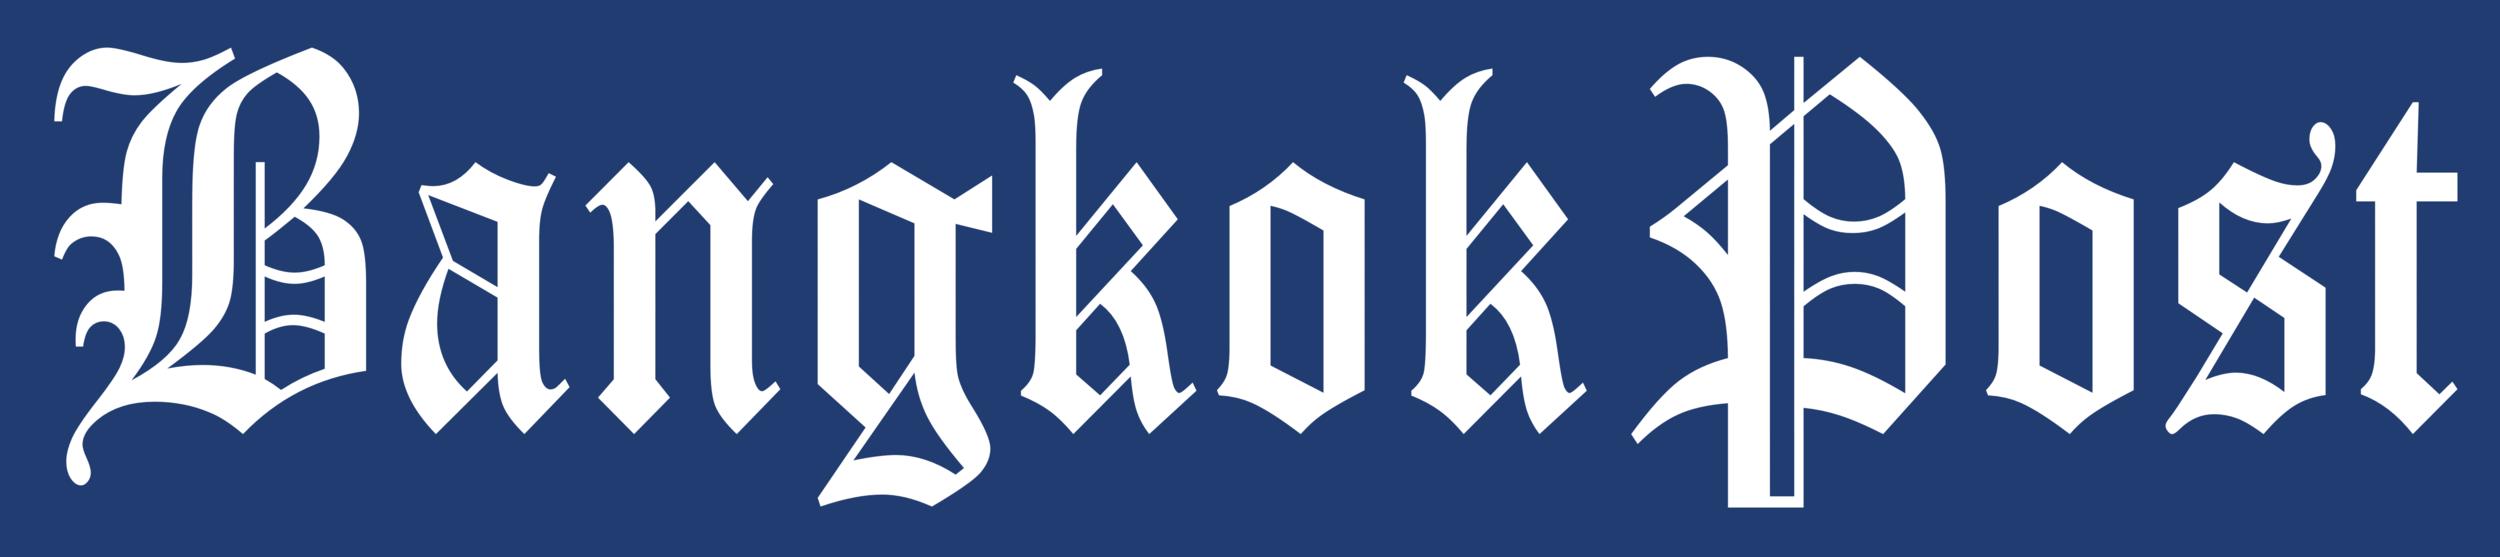 Bangkok_Post_logo_blue_bg.png